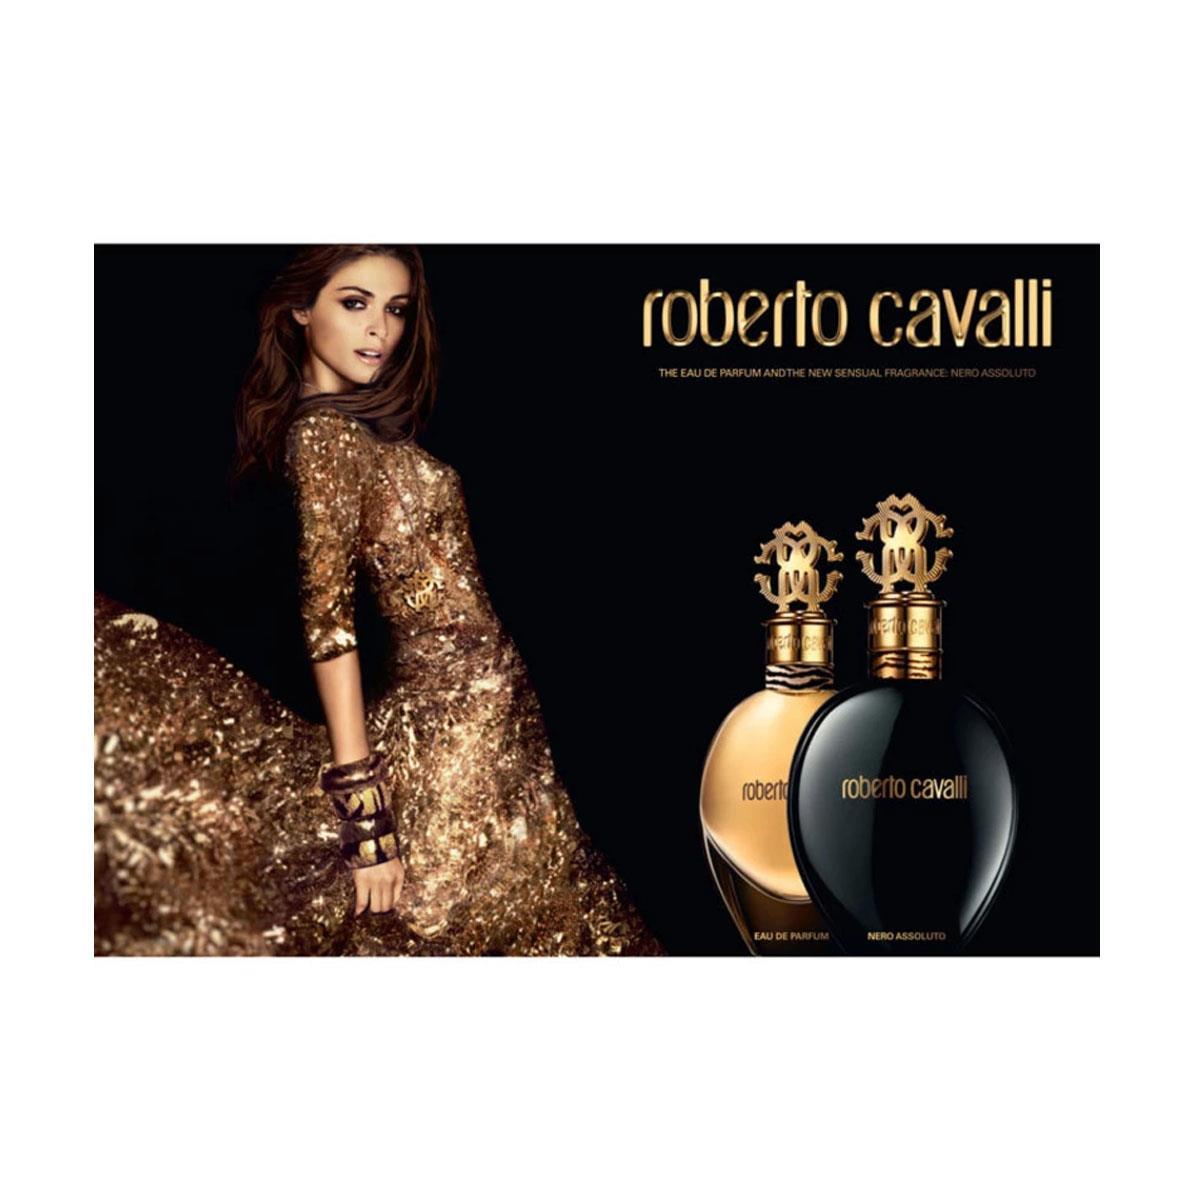 ecafdd0cdfc1a Perfume Roberto Cavalli Nero Assoluto Eau de Parfum Feminino